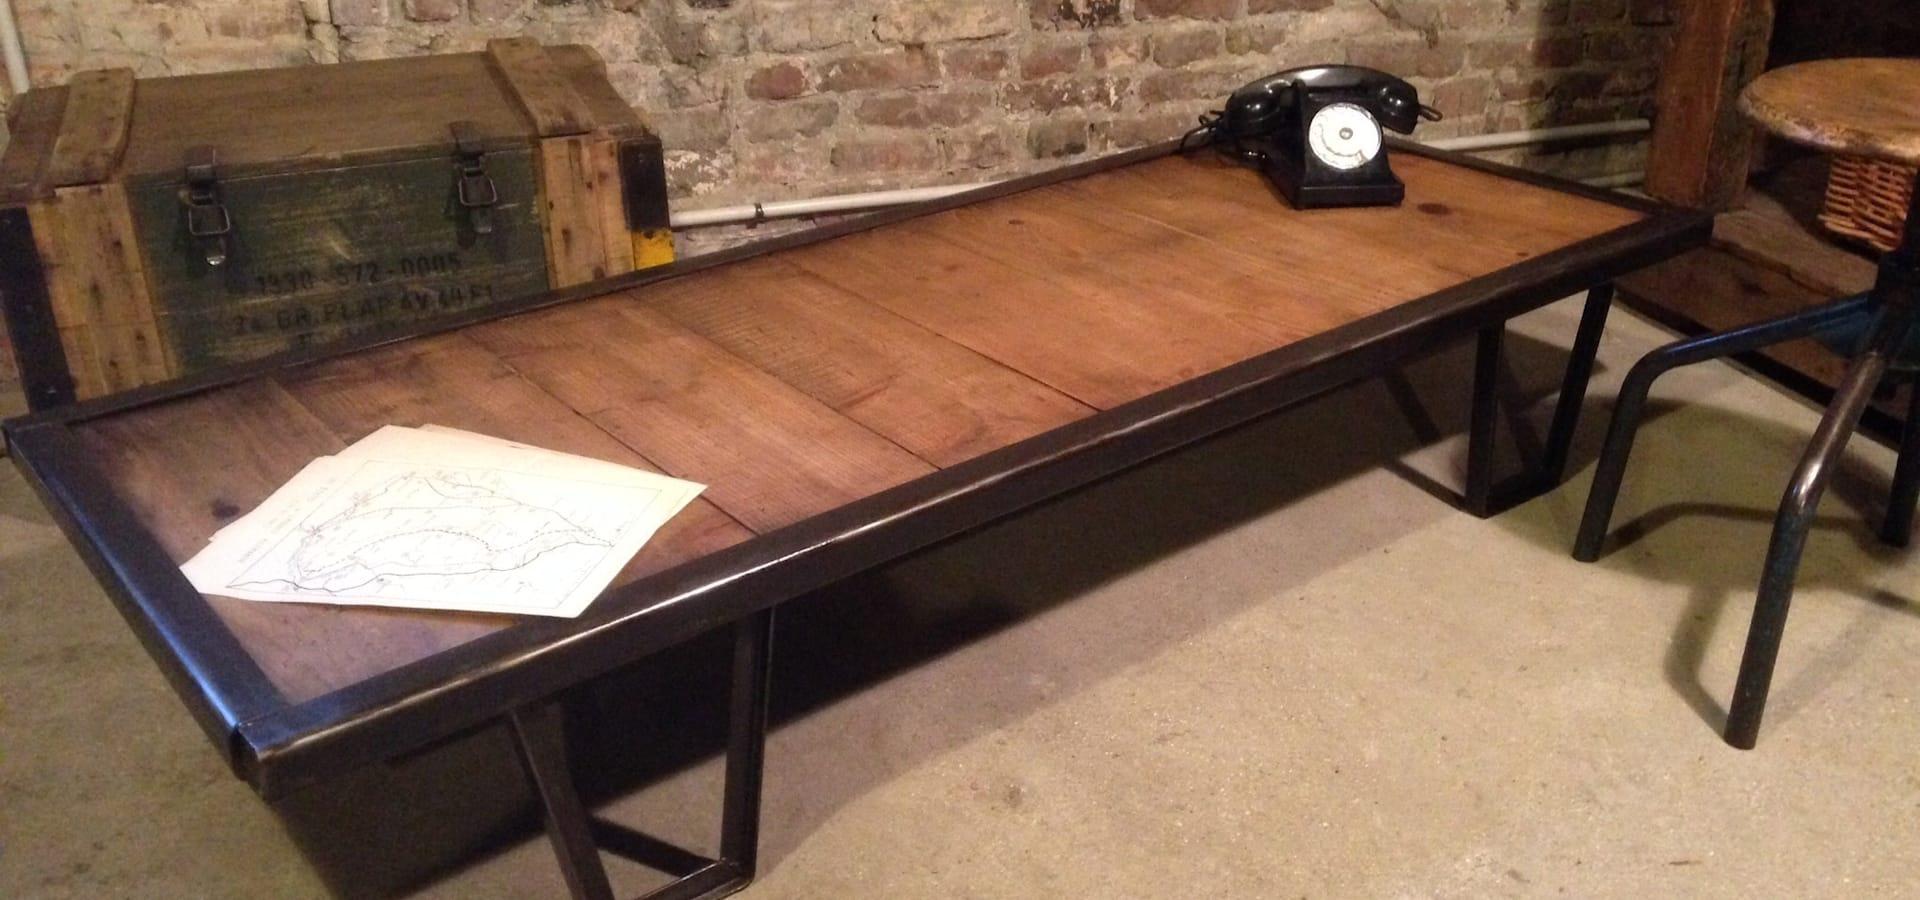 Table basse industrielle ancienne